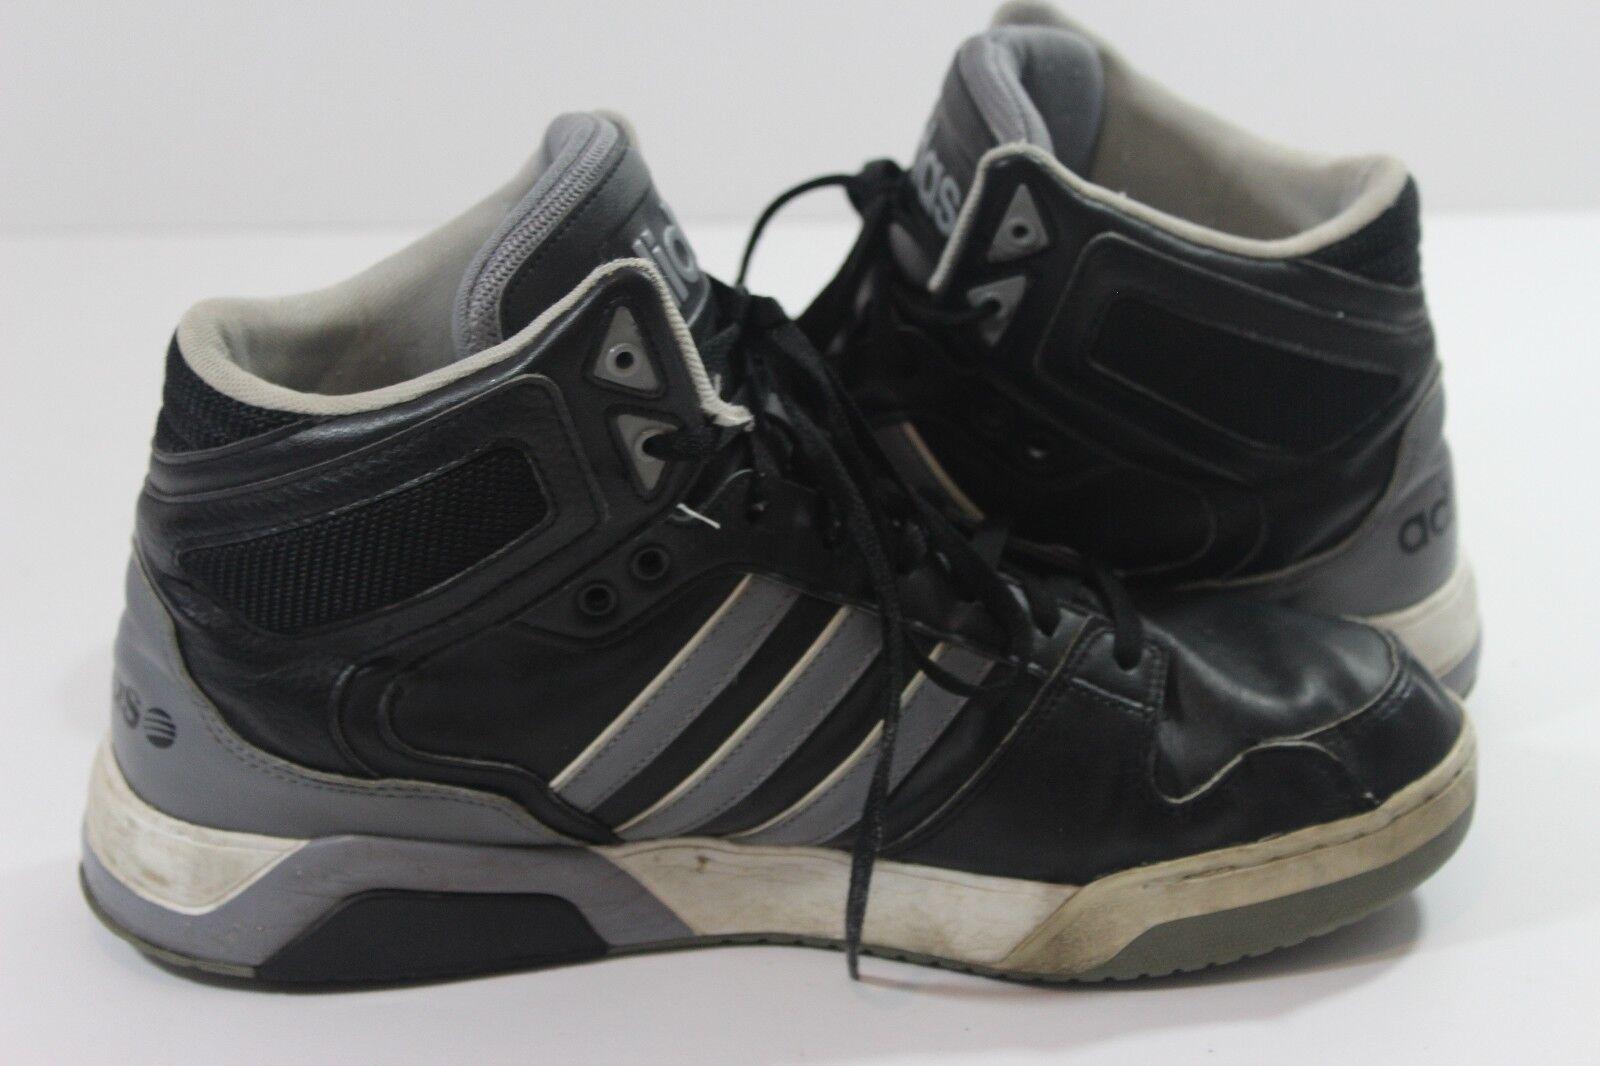 Adidas F97799 Men's NEO Comfortable Seasonal clearance sale